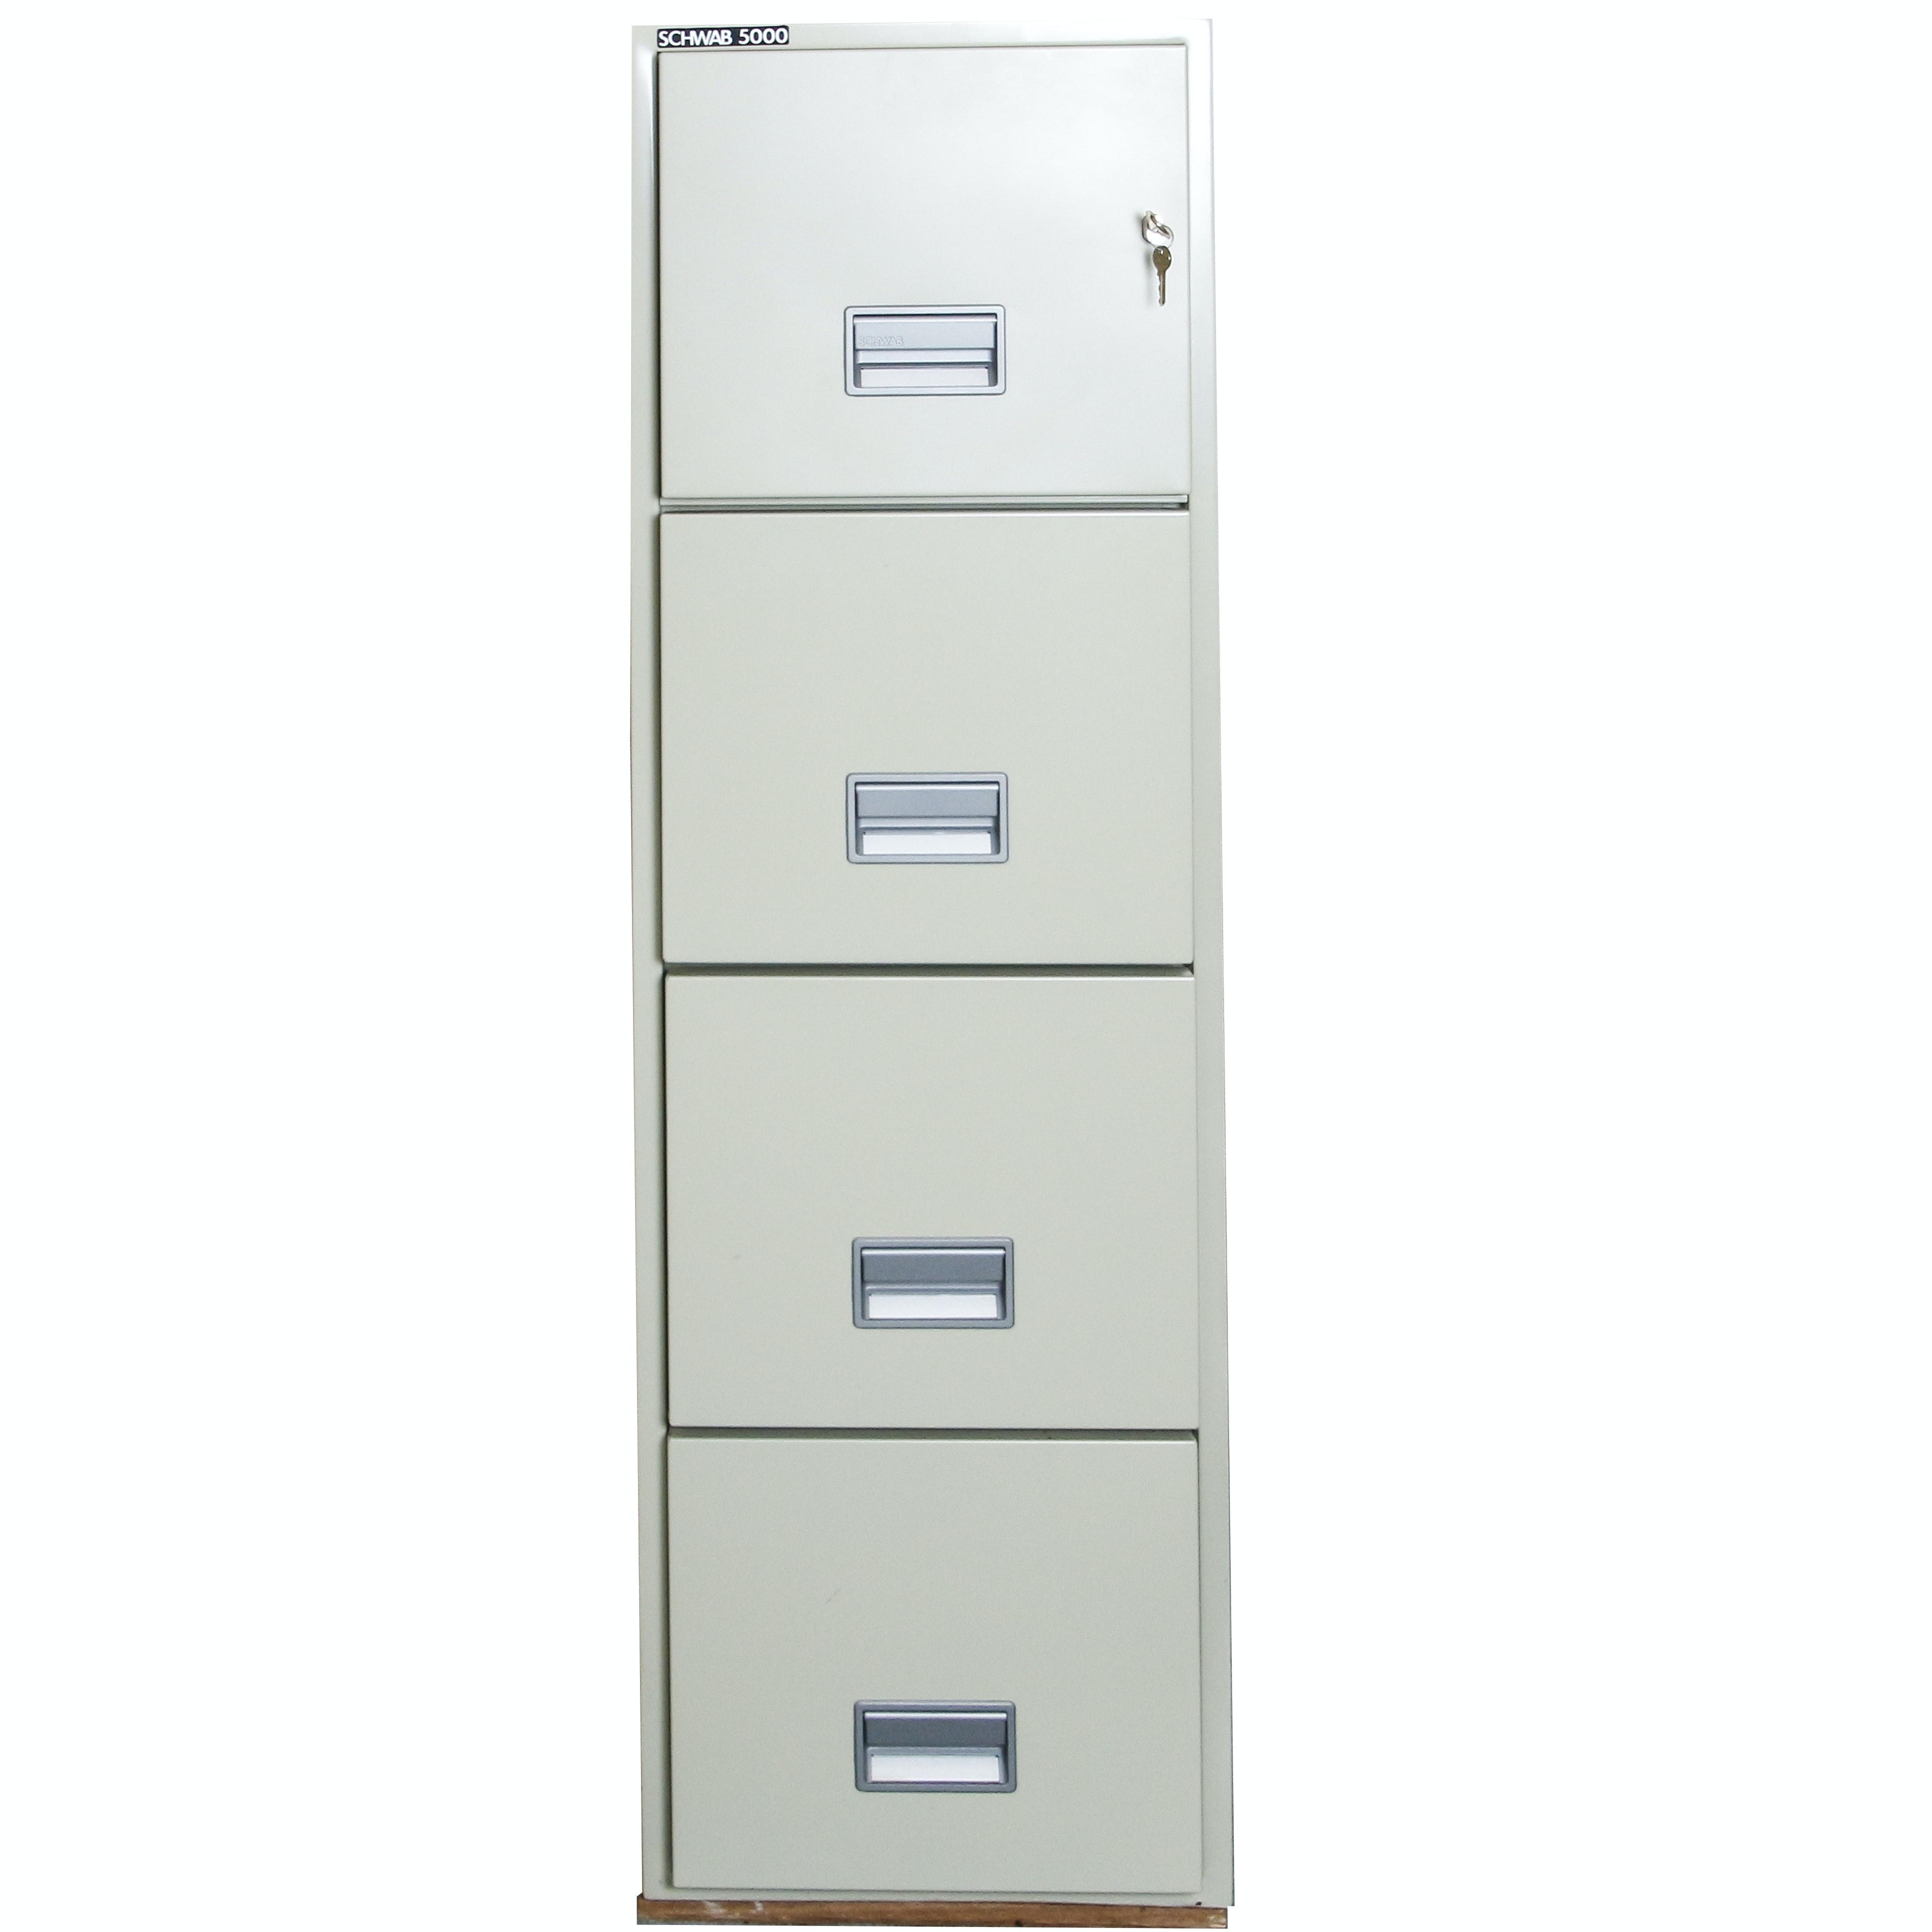 Schwabb 5000 Metal Four Drawer File Cabinet